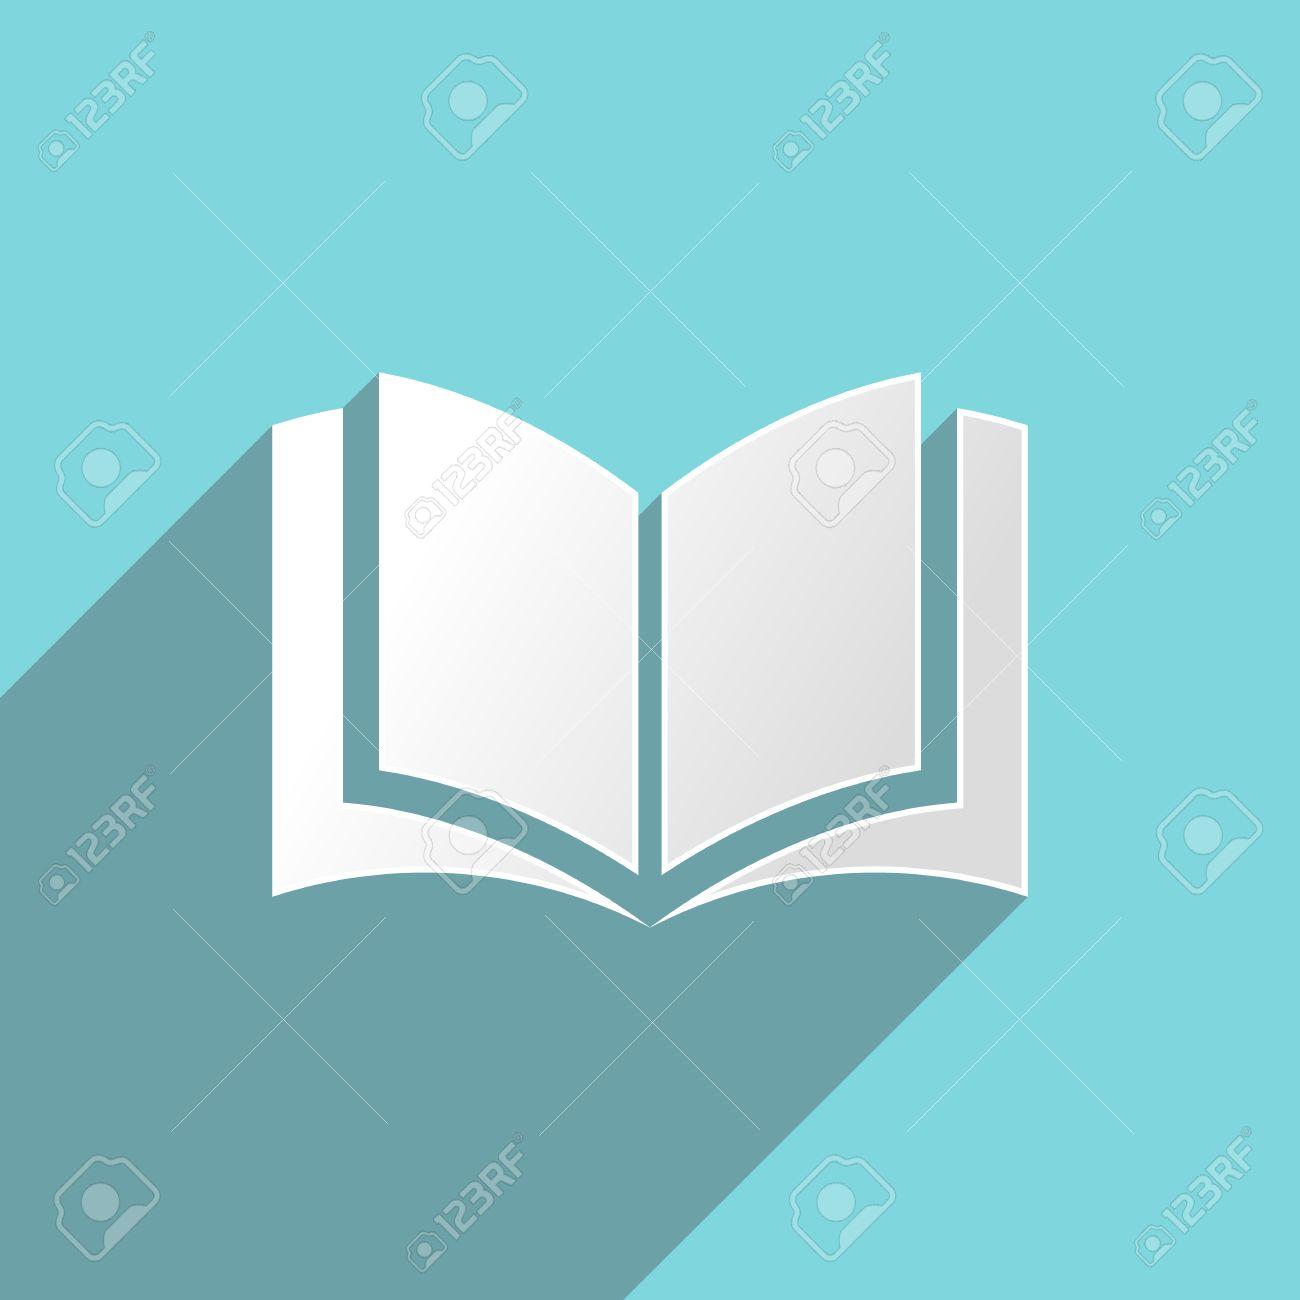 Livre Blanc Sur Fond Turquoise Icone Design Plat